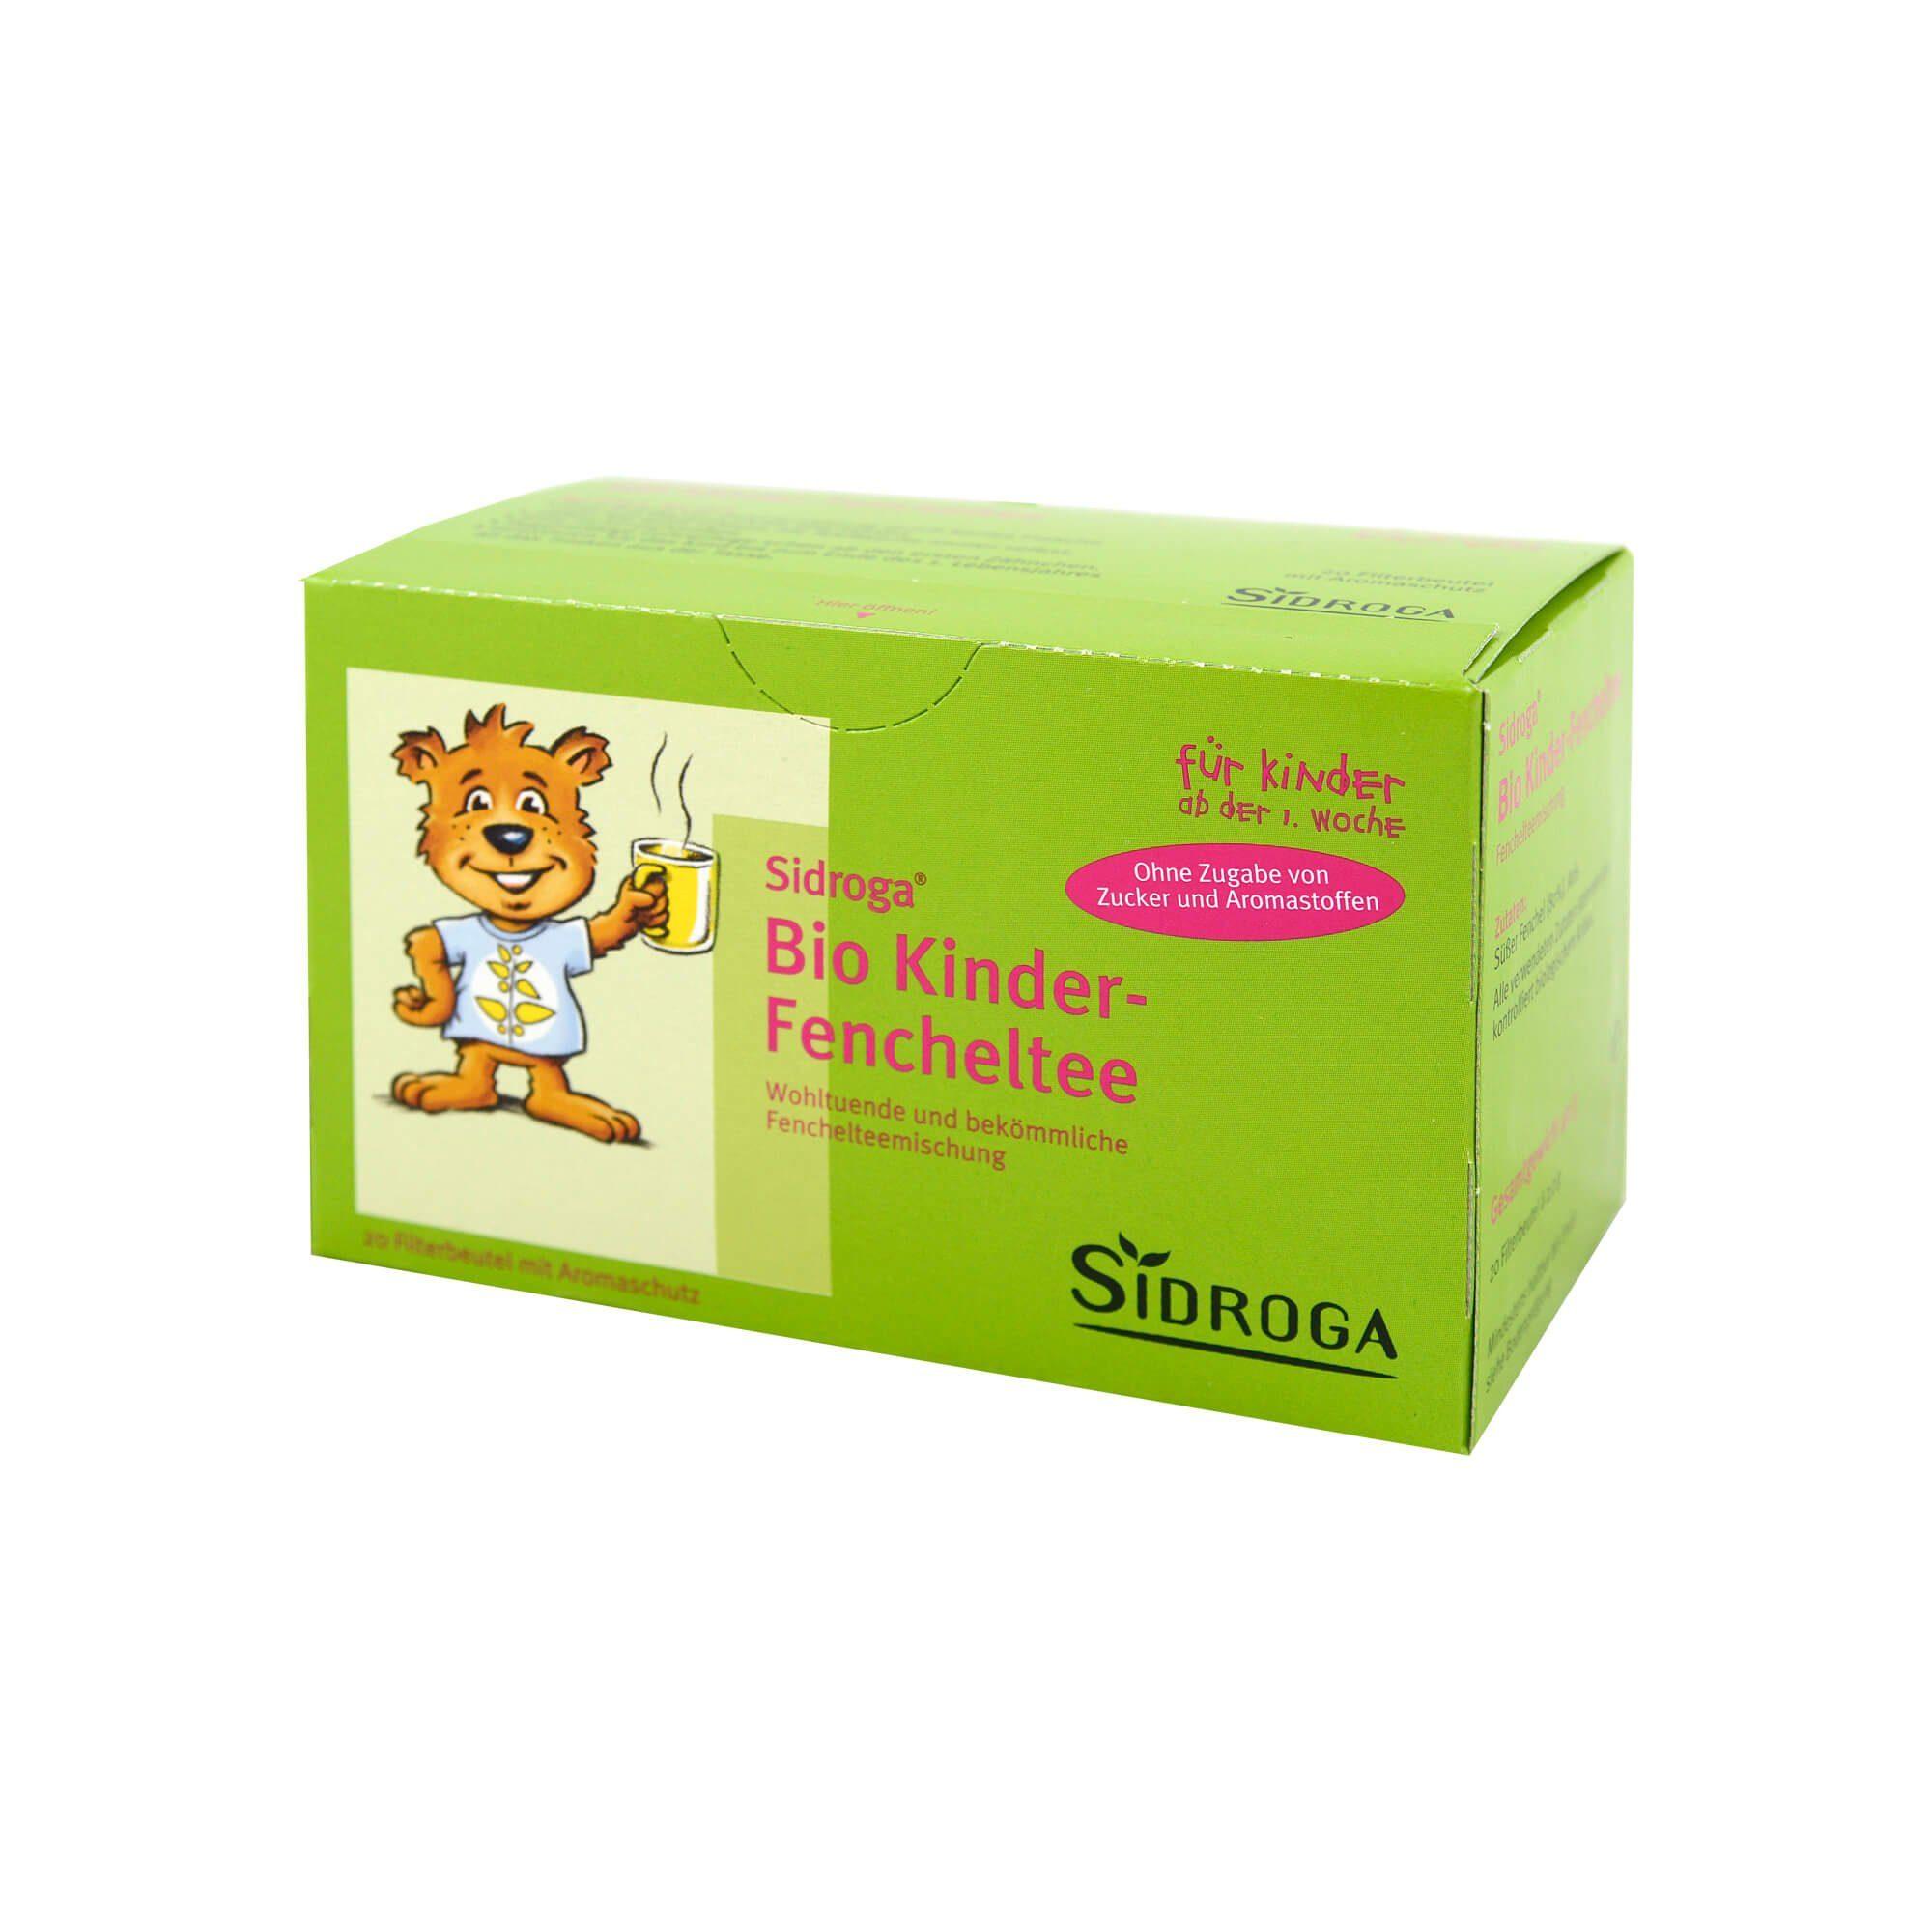 Sidroga Bio Kinder-Fencheltee Filterbeutel , 20 St